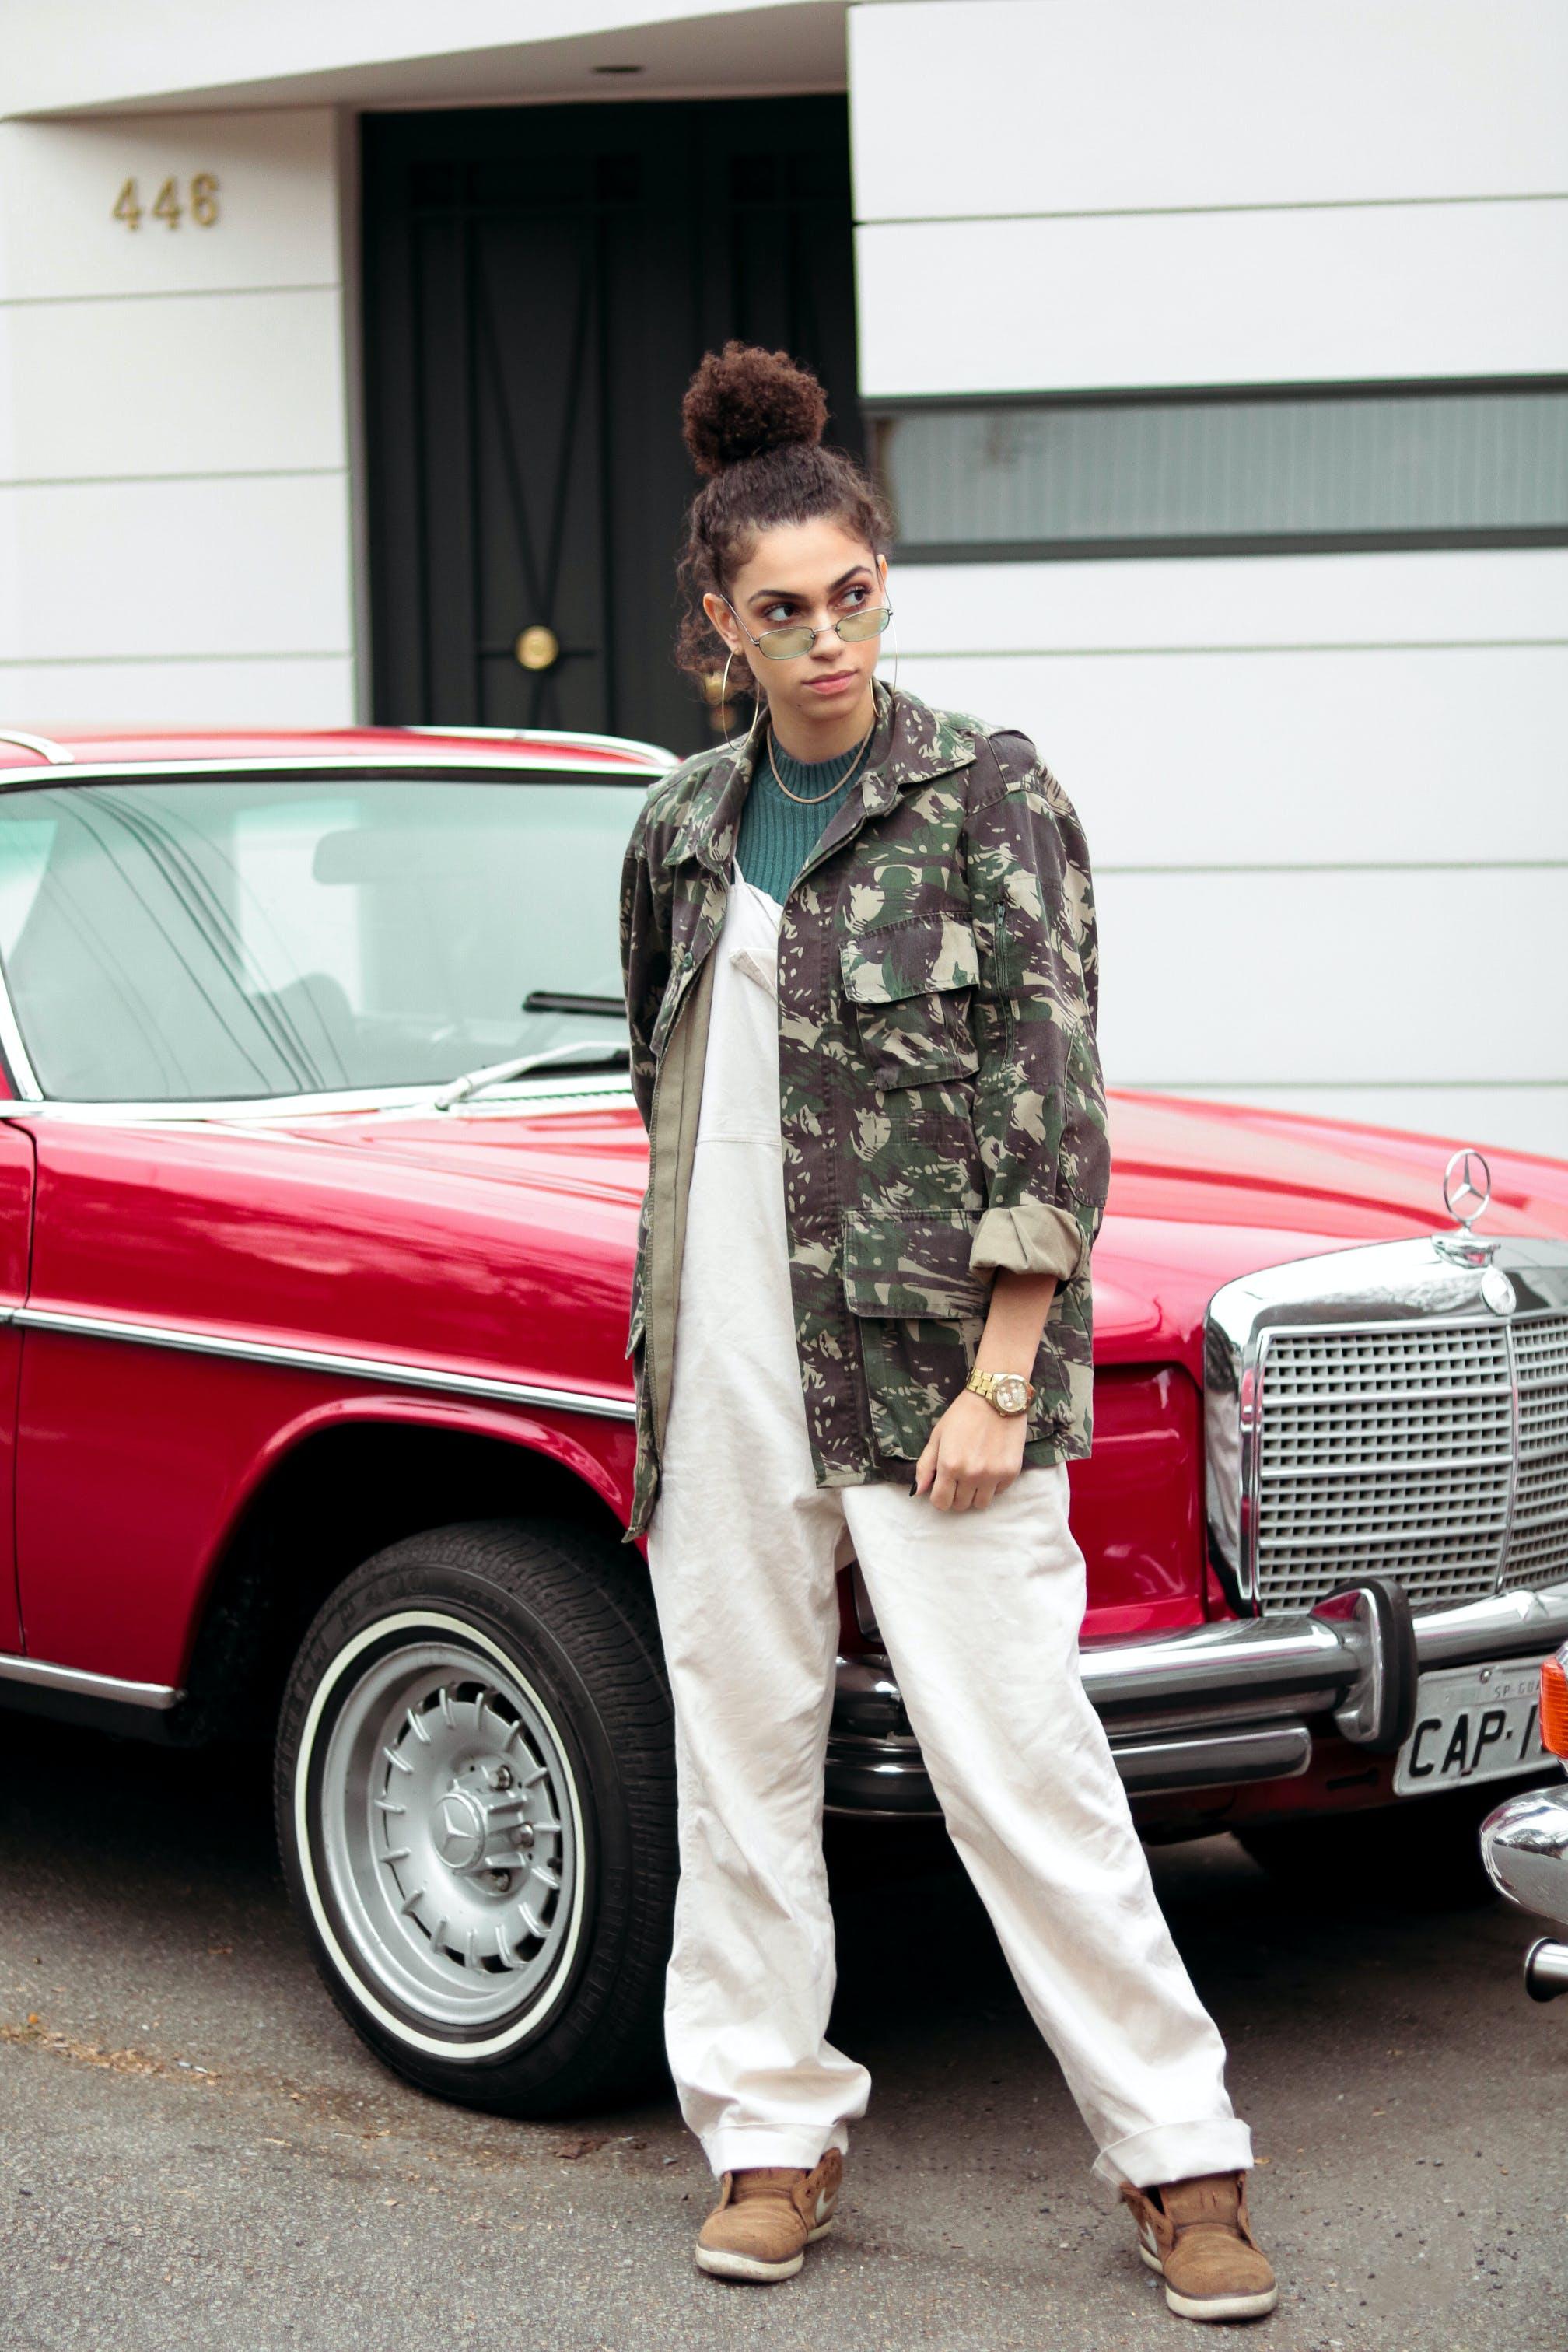 Woman Standing Beside Vintage Mercedes Benz Car